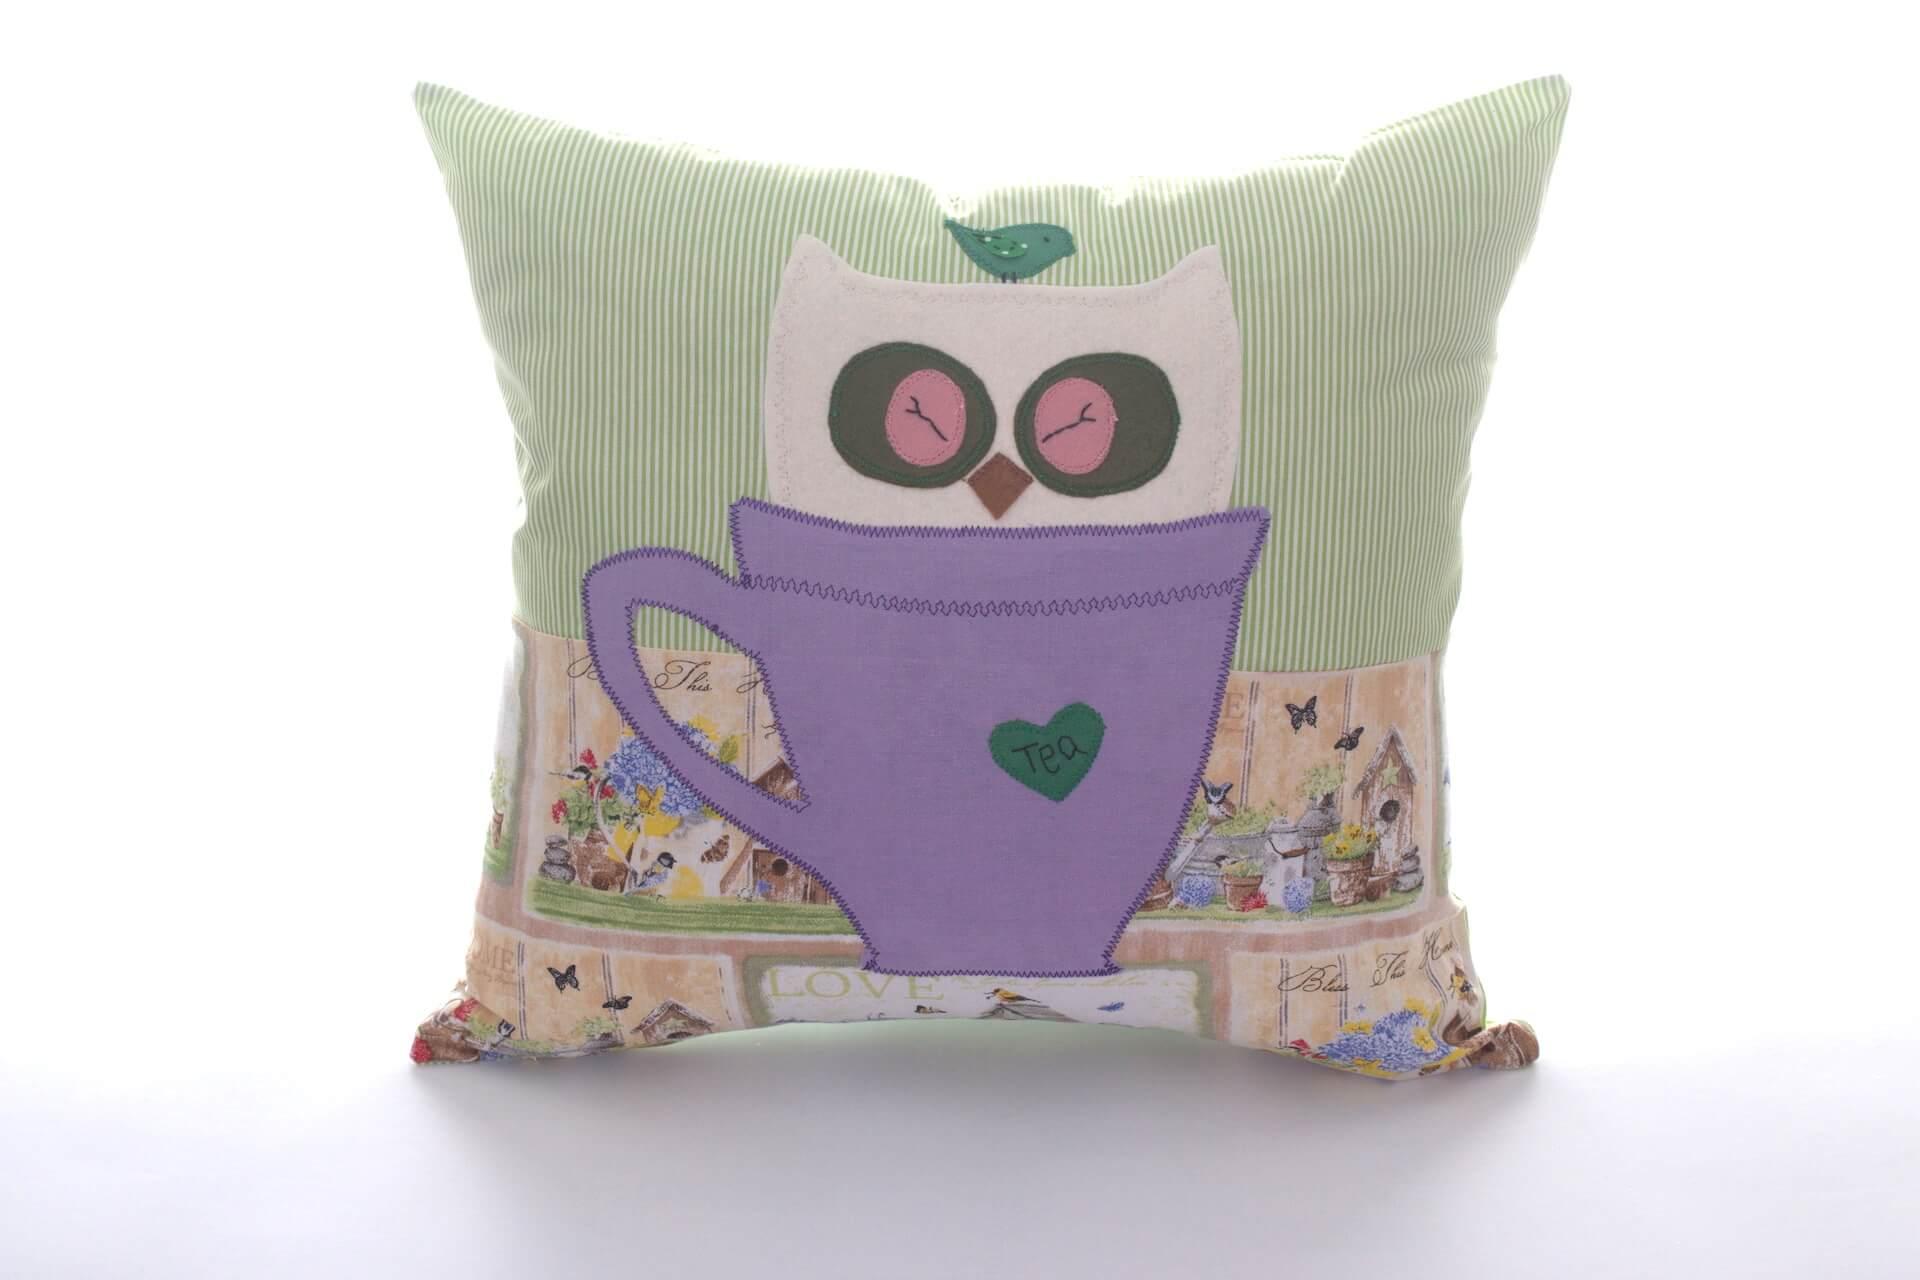 Decorative Pillows Homemade : Handmade decorative pillow Owl in Cup, 40x40 cm - Bowema